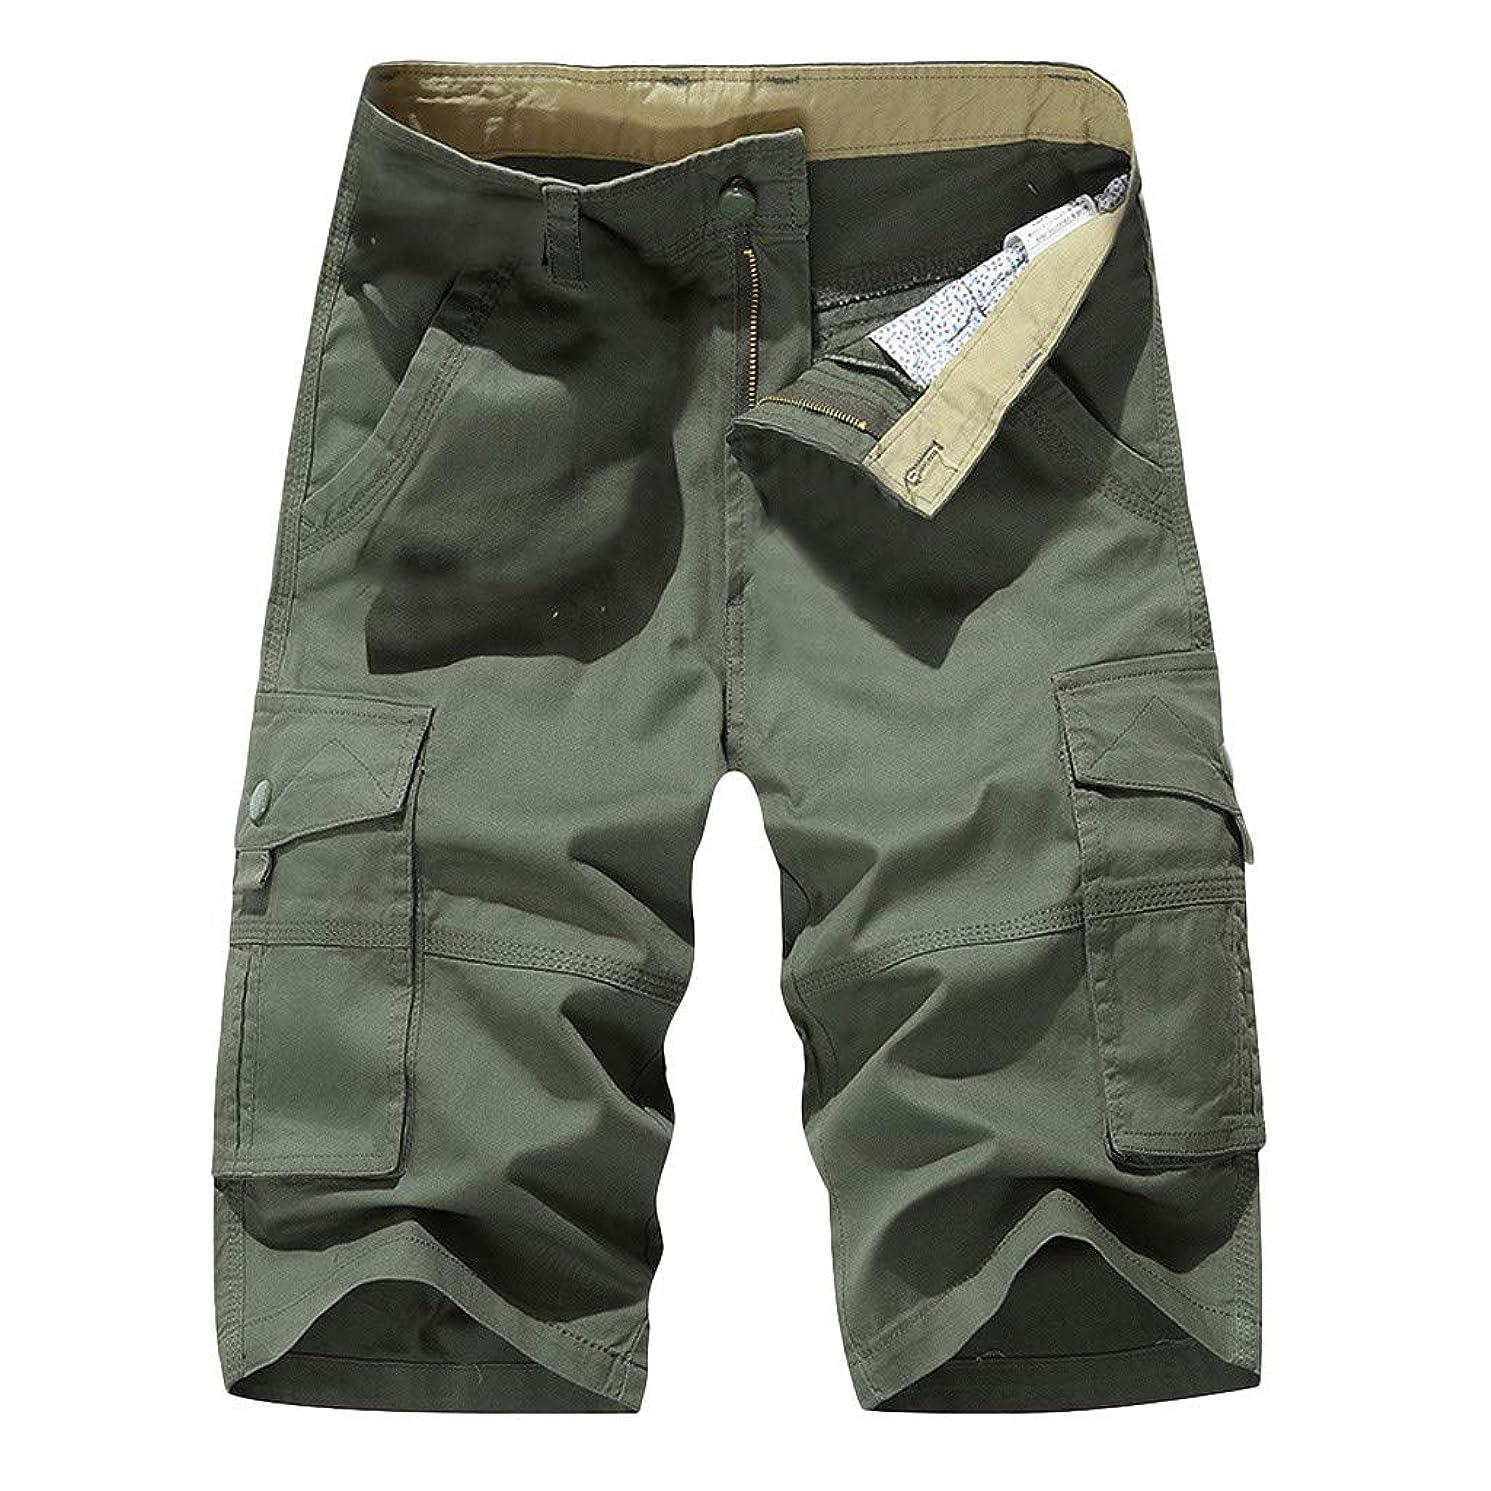 Mens Shorts Casual Mens Shorts Cargo 7 Inch Shorts with Zipper Pockets Pants